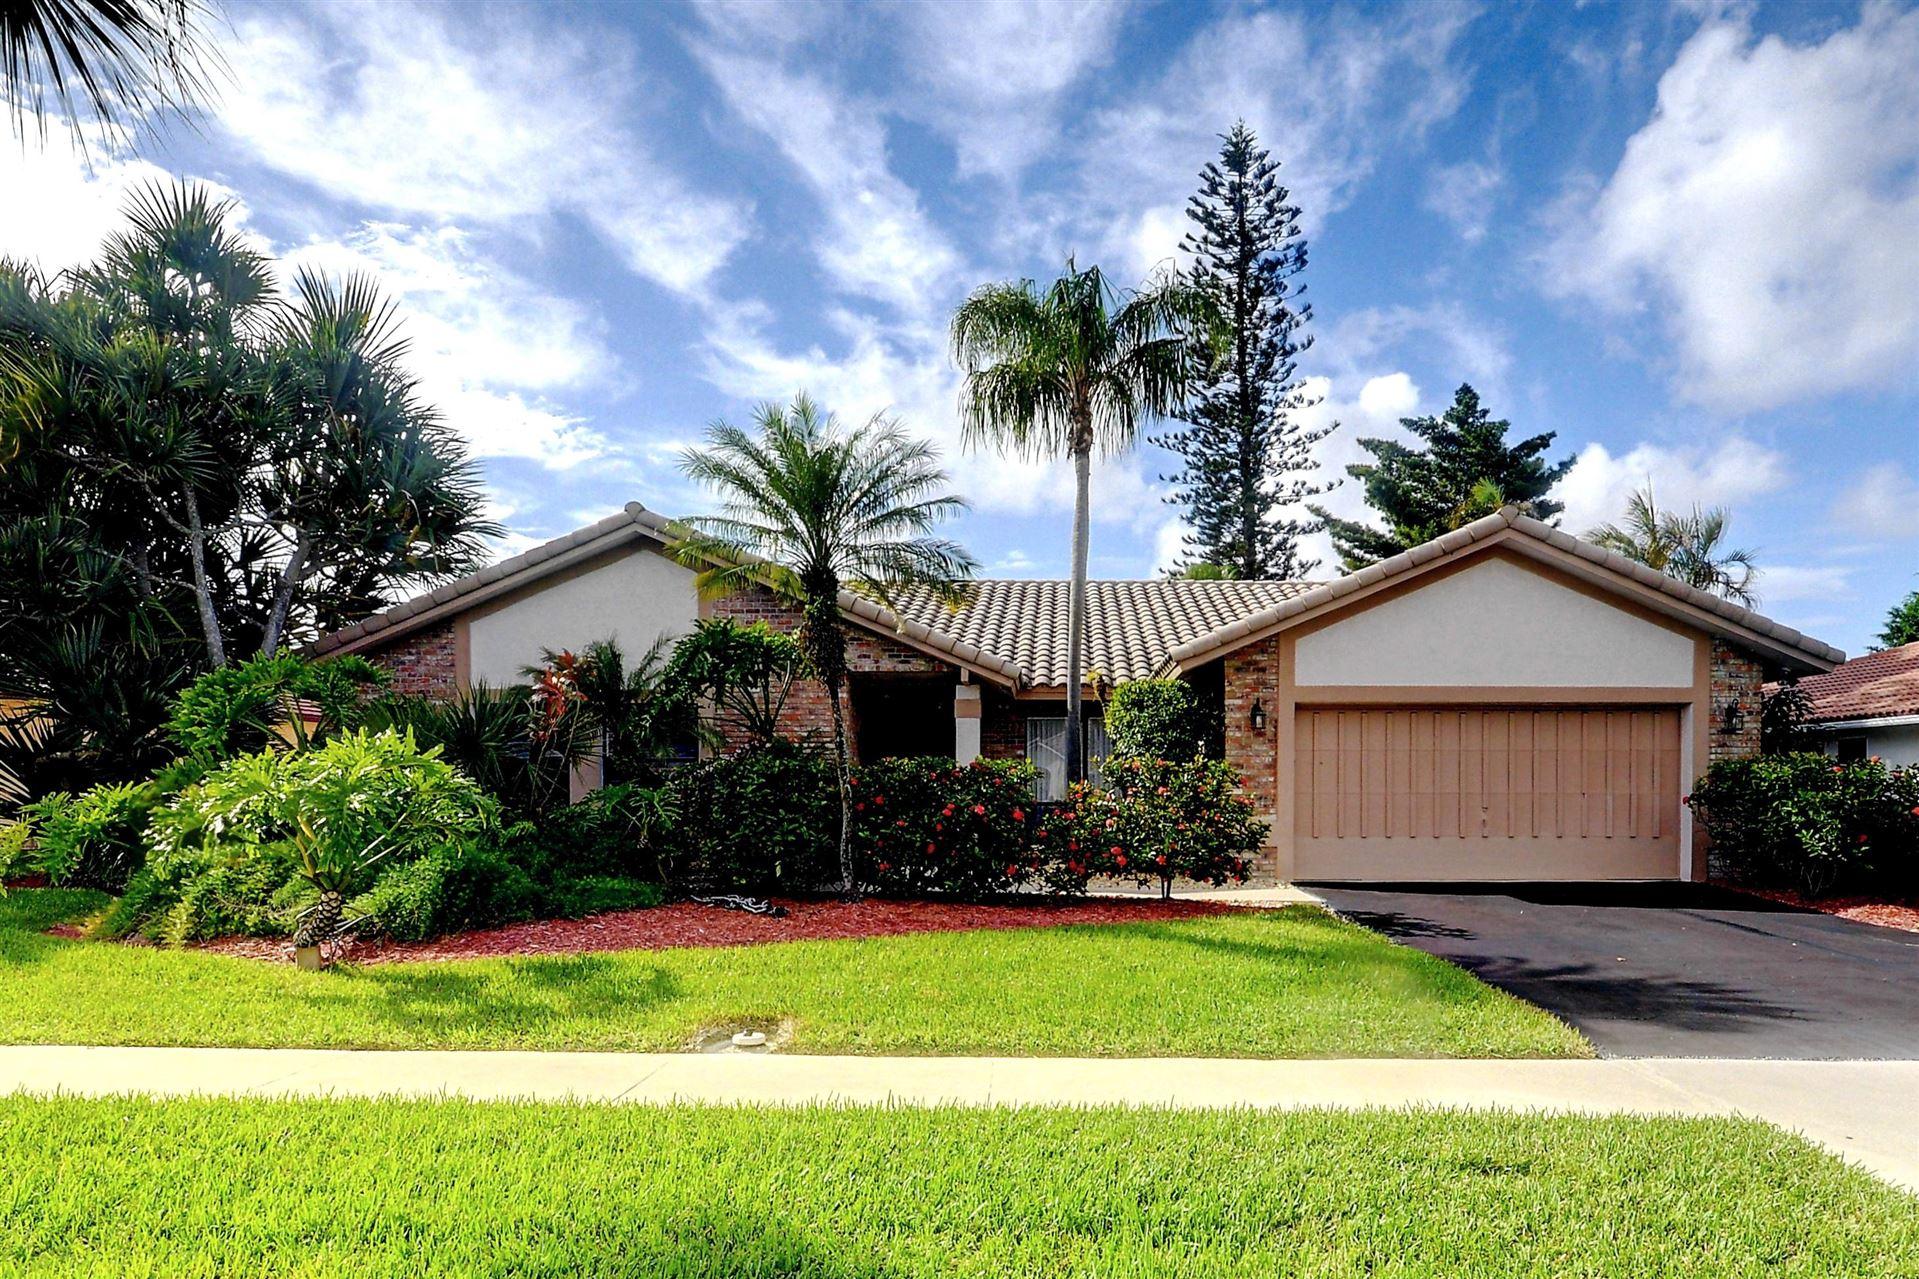 20007 Back Nine Drive, Boca Raton, FL 33498 - #: RX-10670704